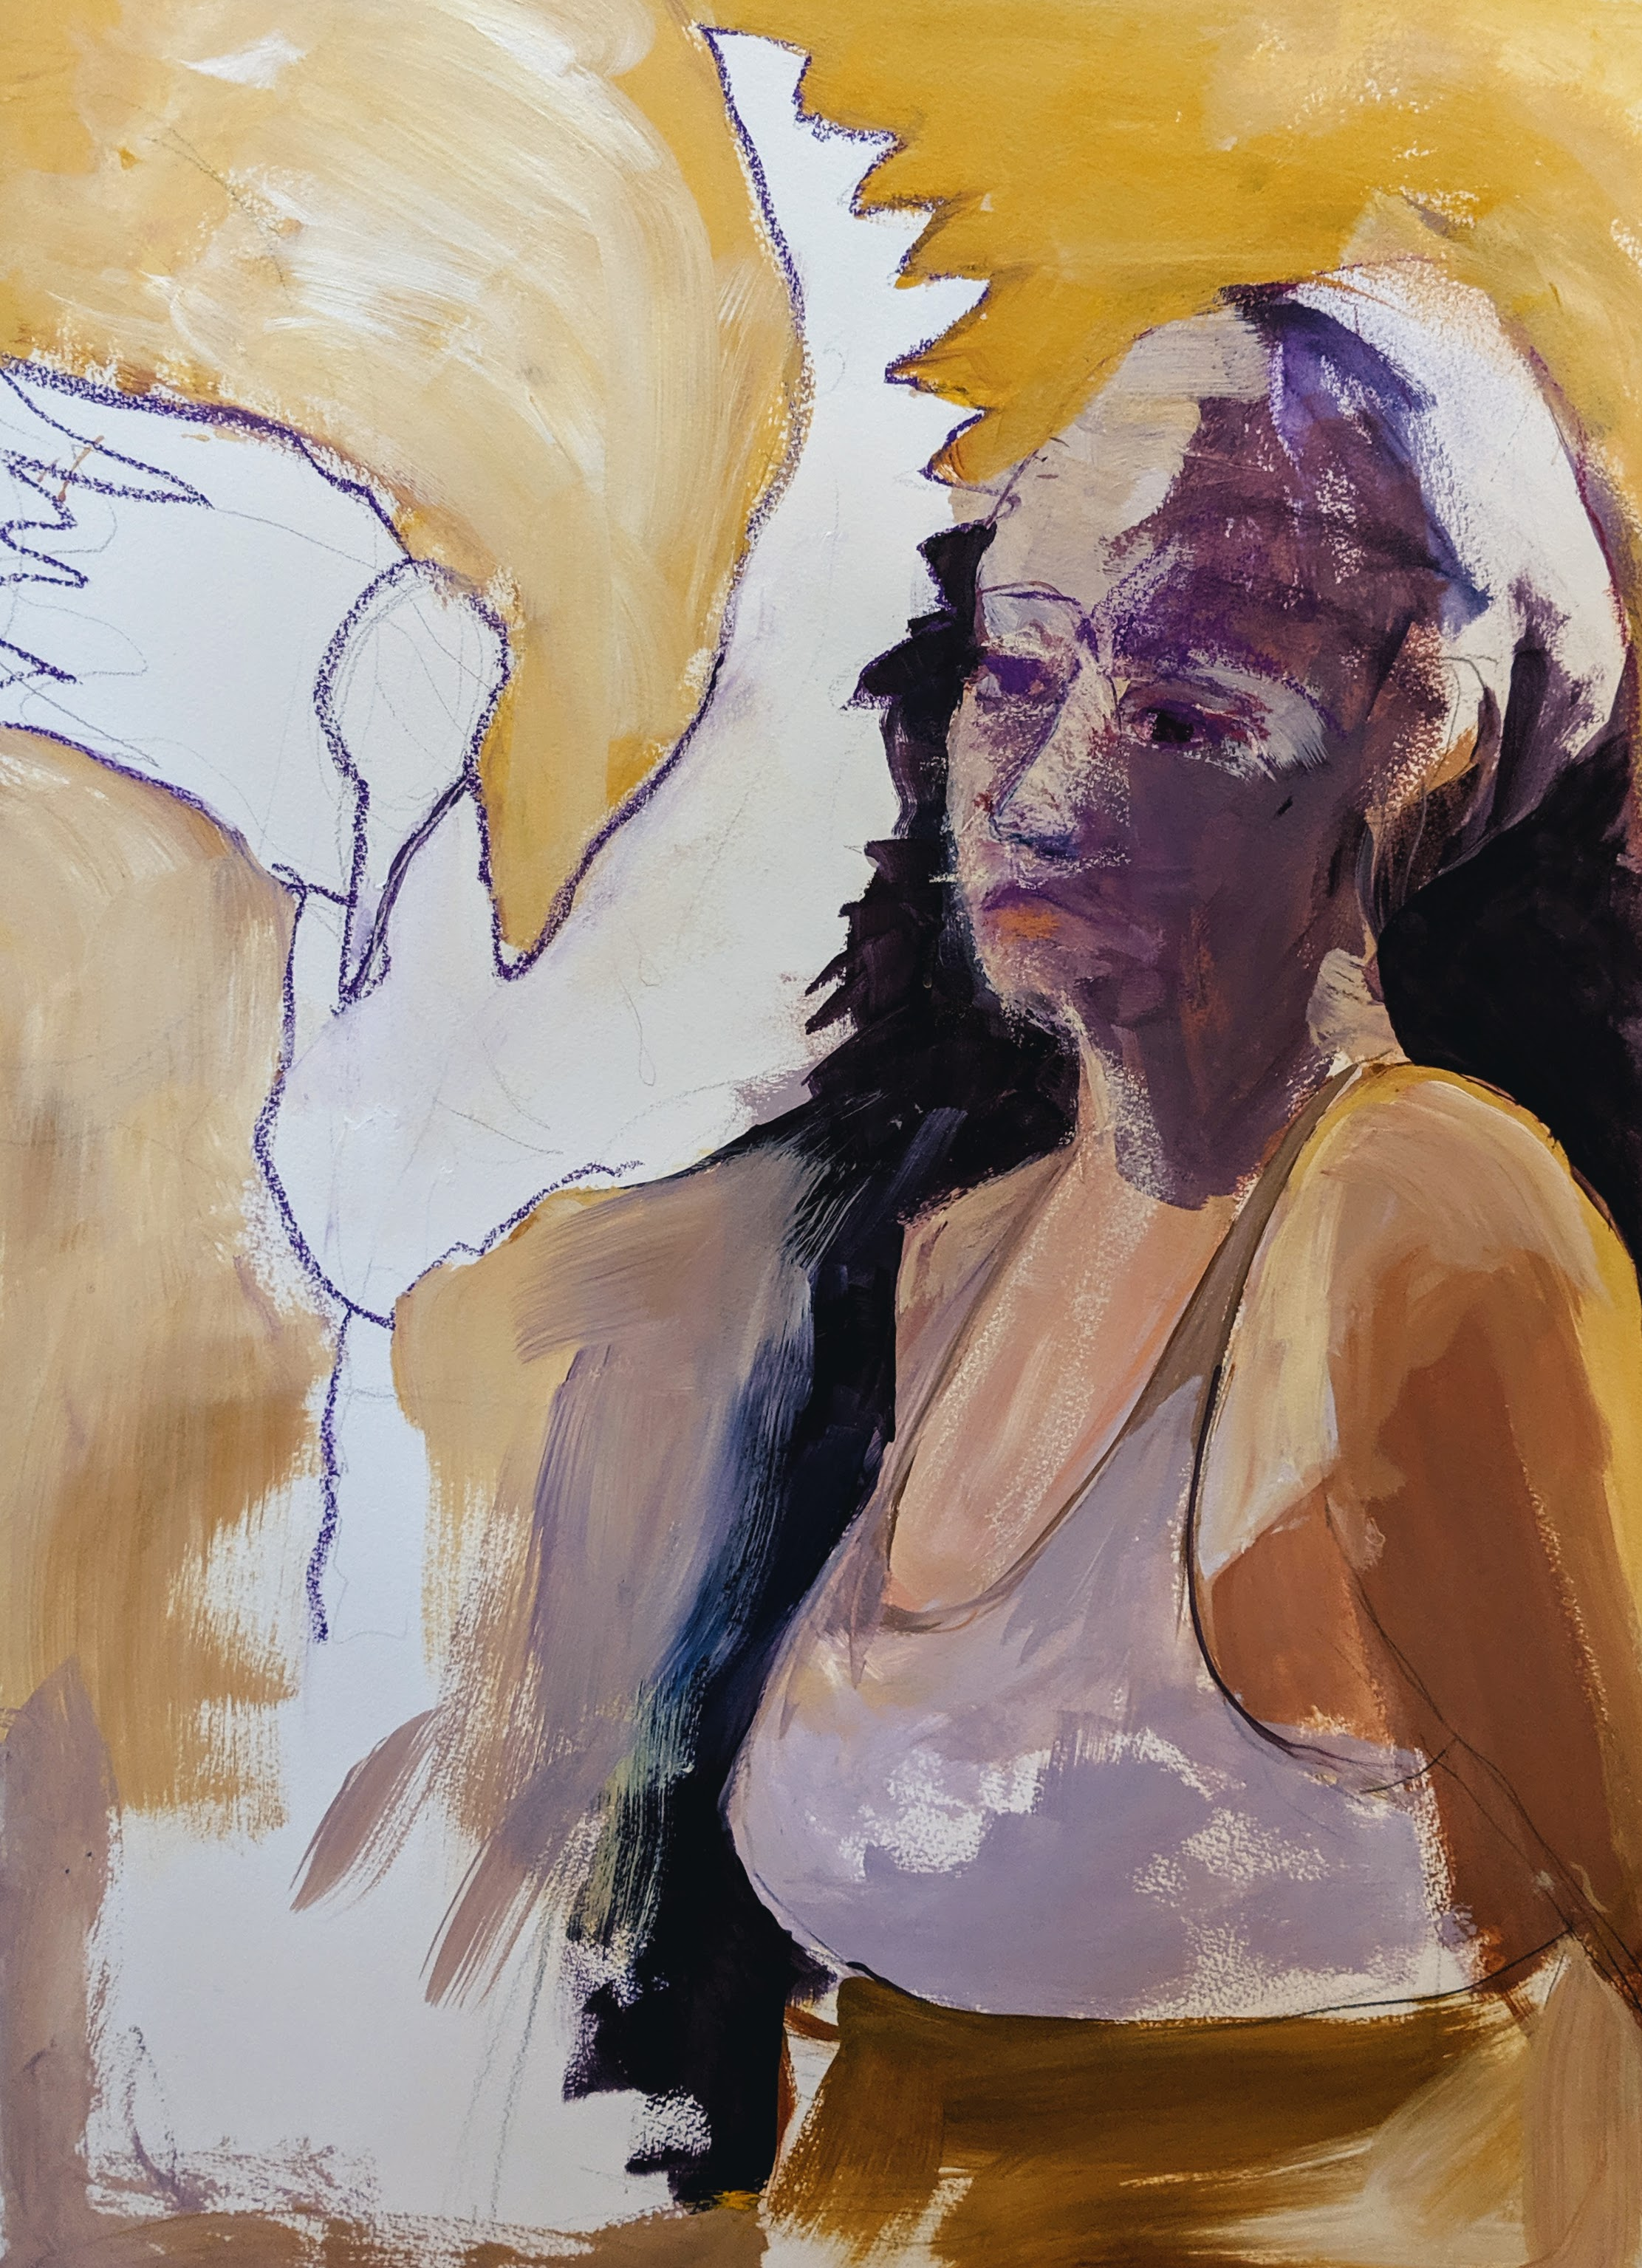 ©2019 Tamara Geenebaum  | Figure Painting & Drawing Workshop, San Luis Obispo County (Arroyo Grande, CA) | David Limrite, Instructor